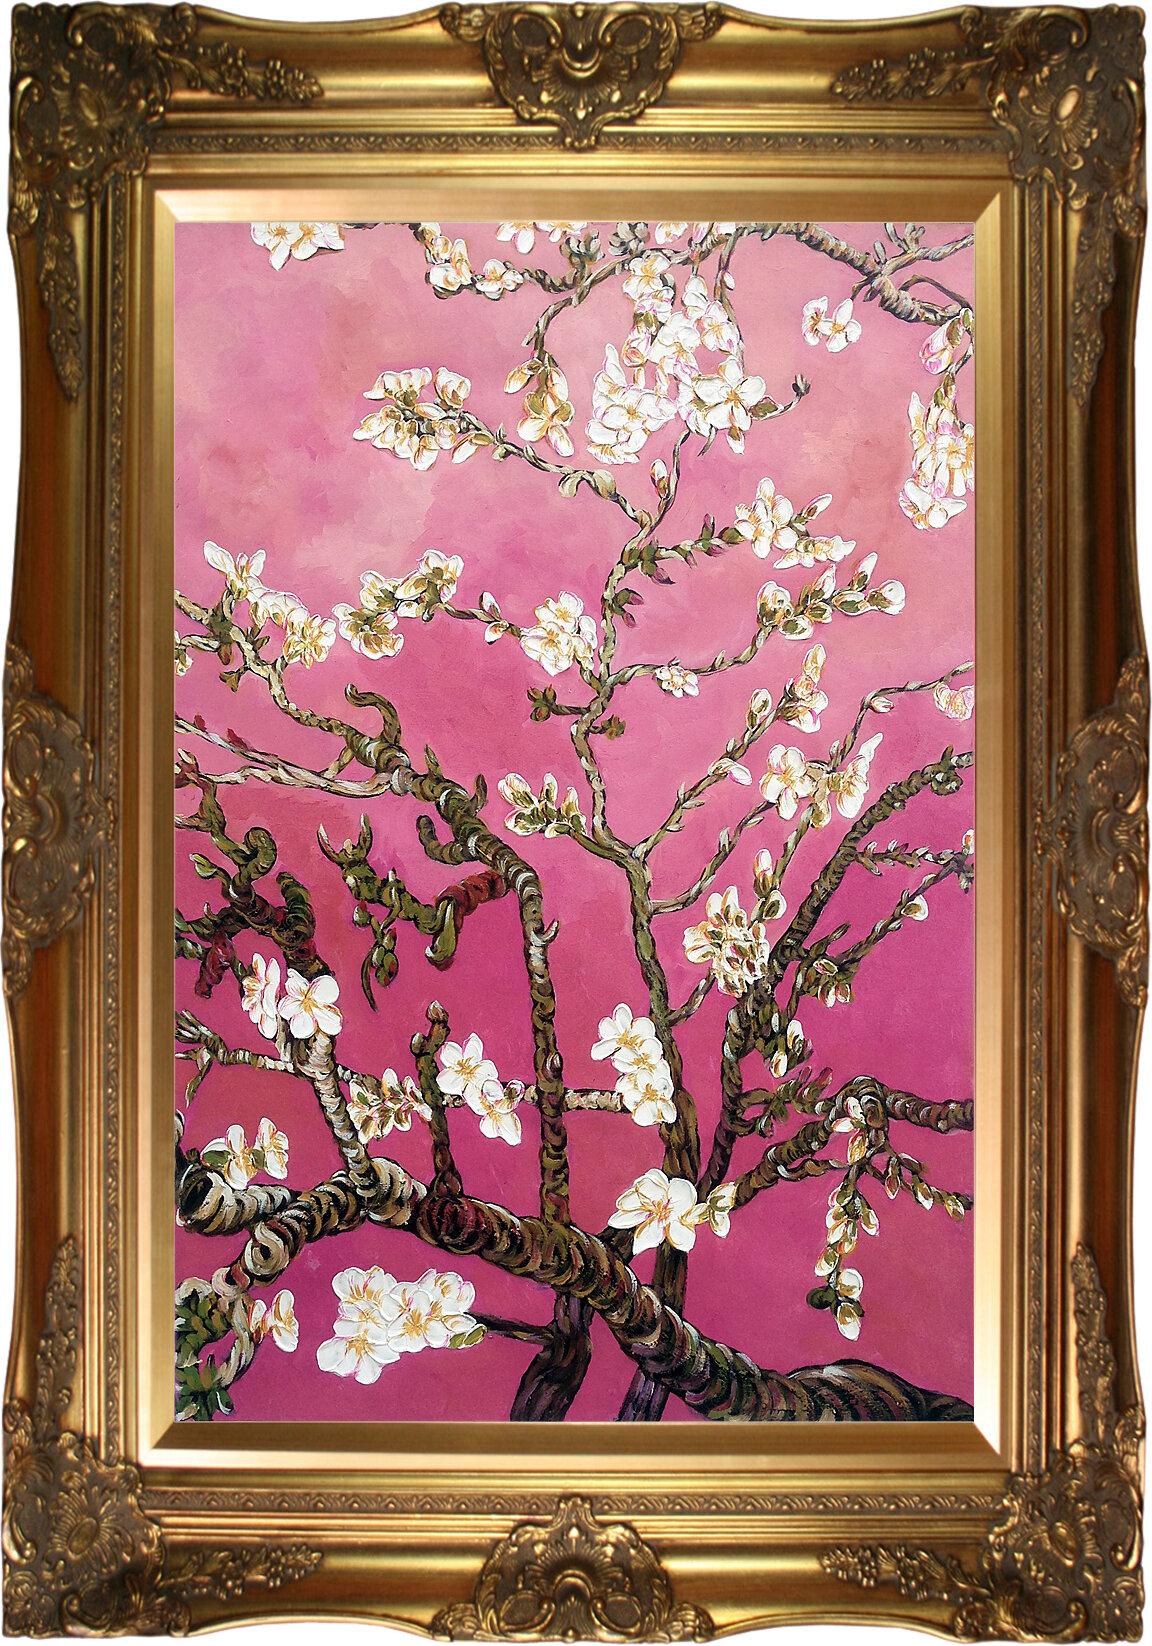 La pastiche almond blossoms vertical pearl pink by vincent van la pastiche almond blossoms vertical pearl pink by vincent van gogh framed painting wayfair mightylinksfo